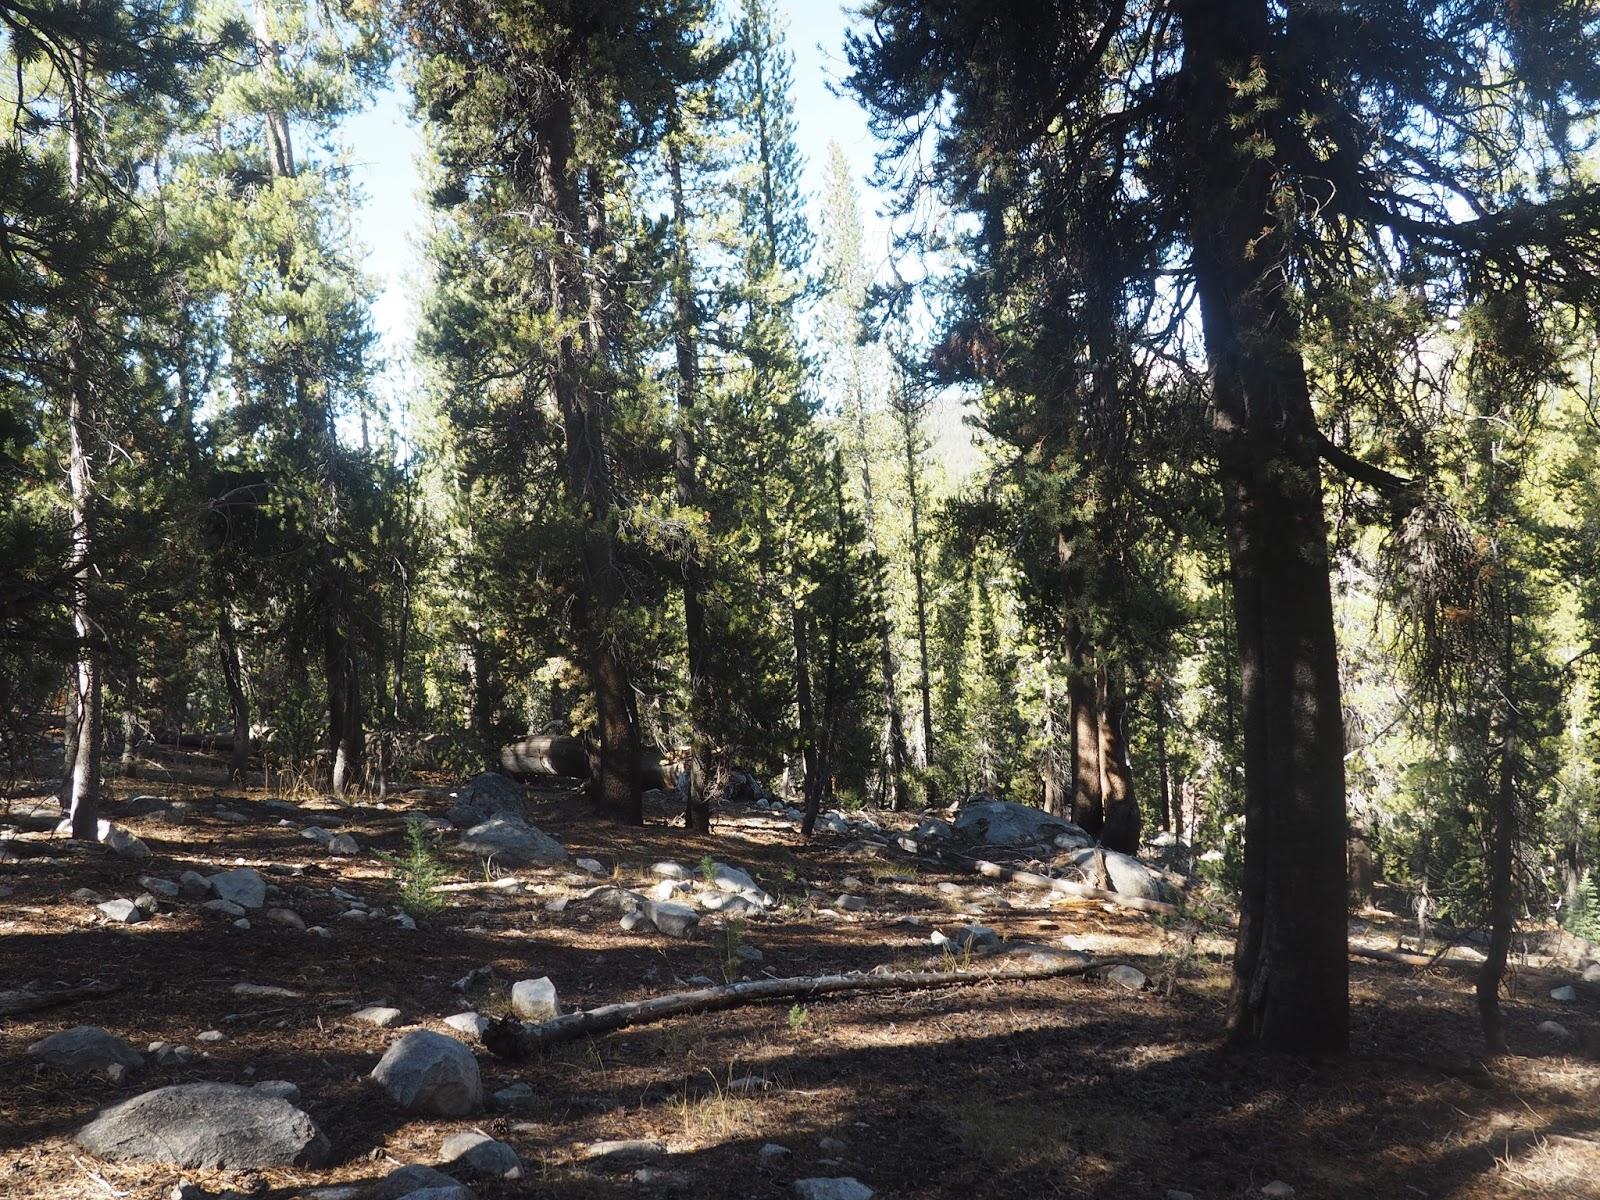 Trees in Yosemite National Park, California